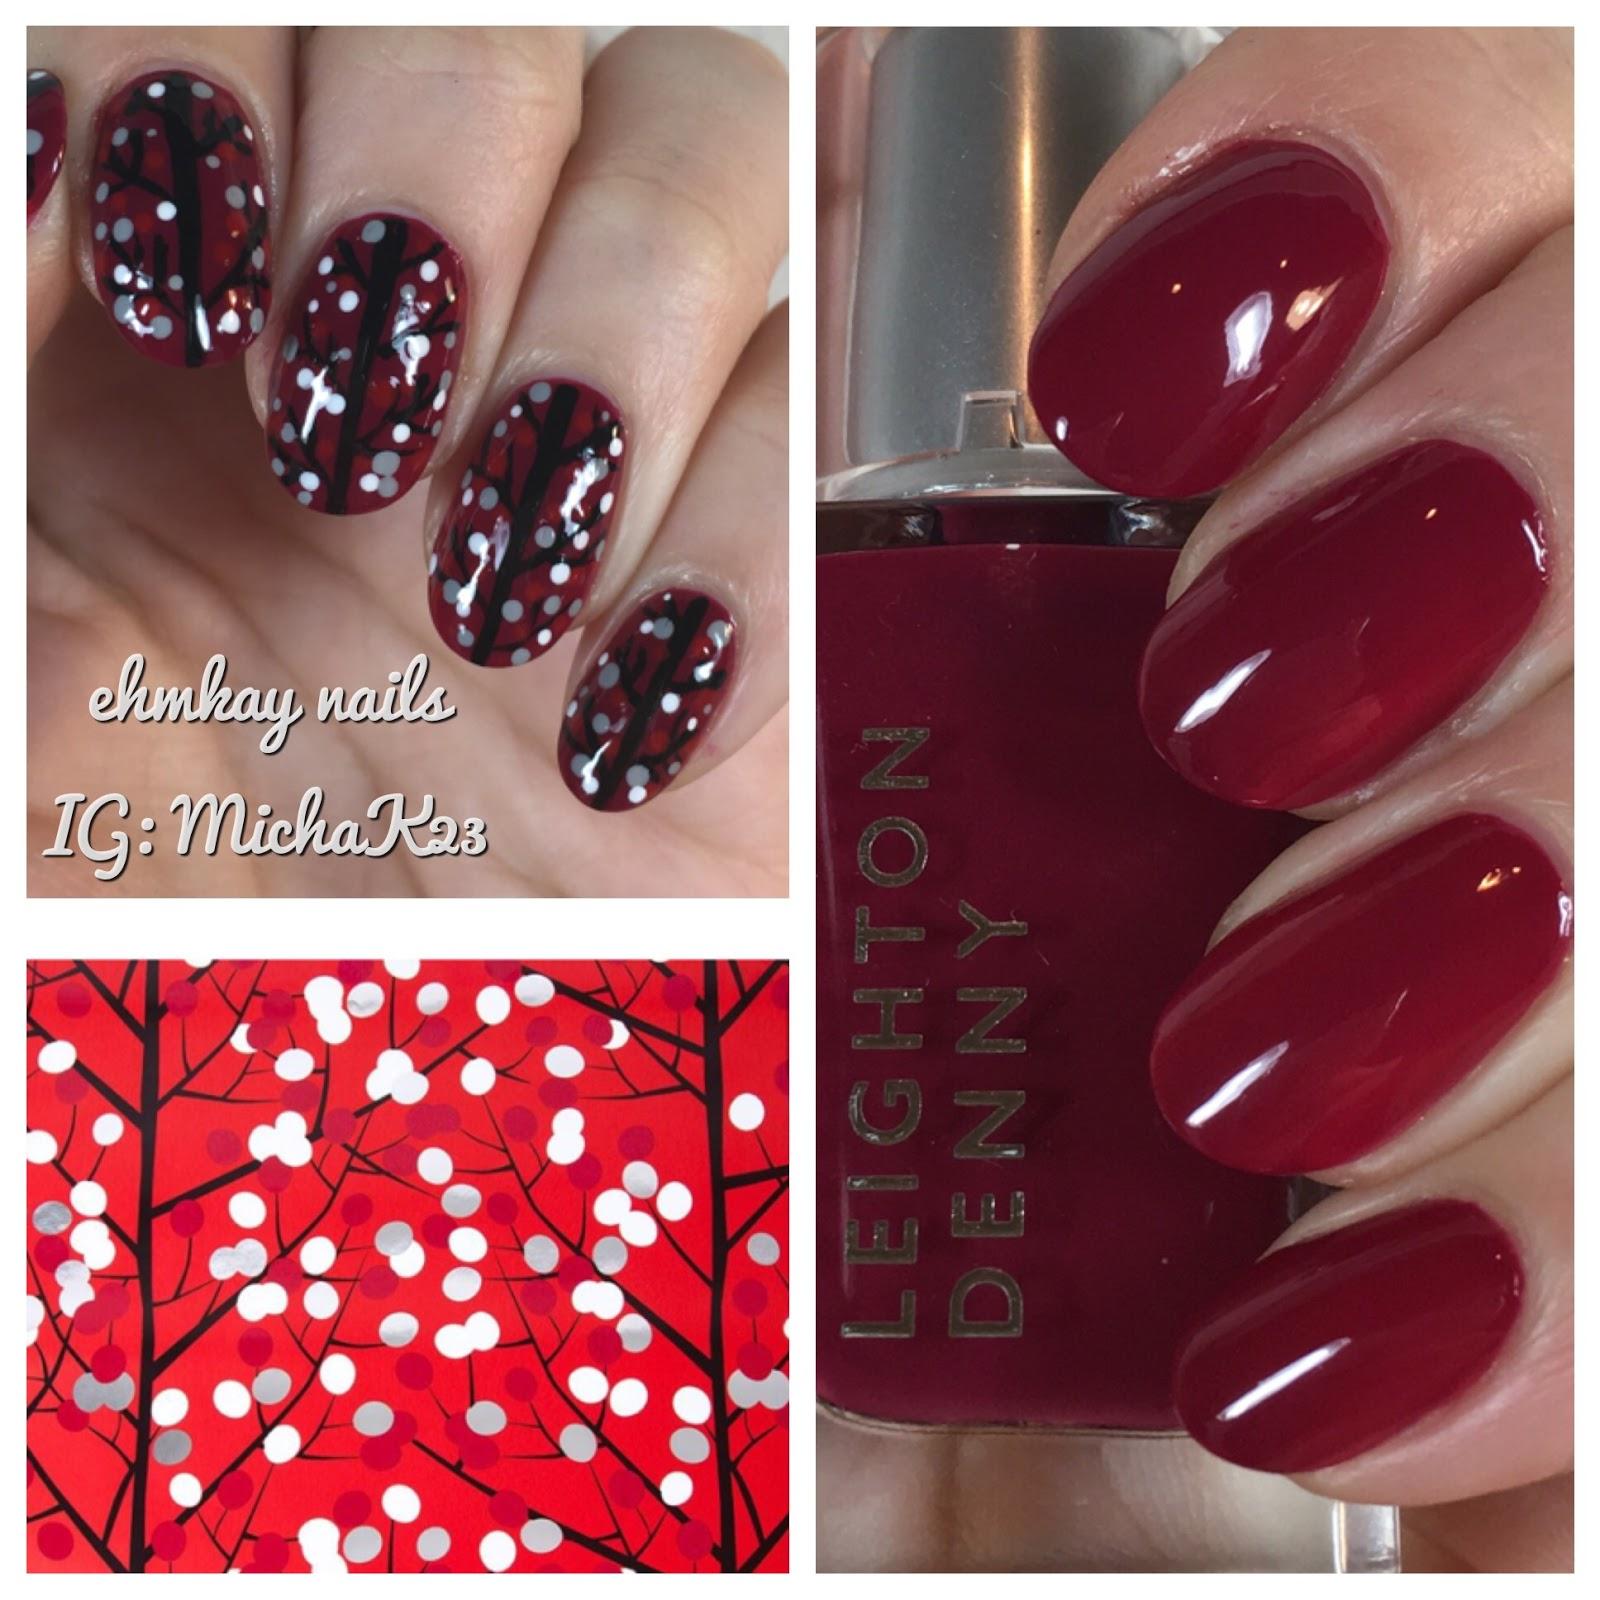 ehmkay nails: Winter Berries Nail Art with Leighton Denny Pillow ...